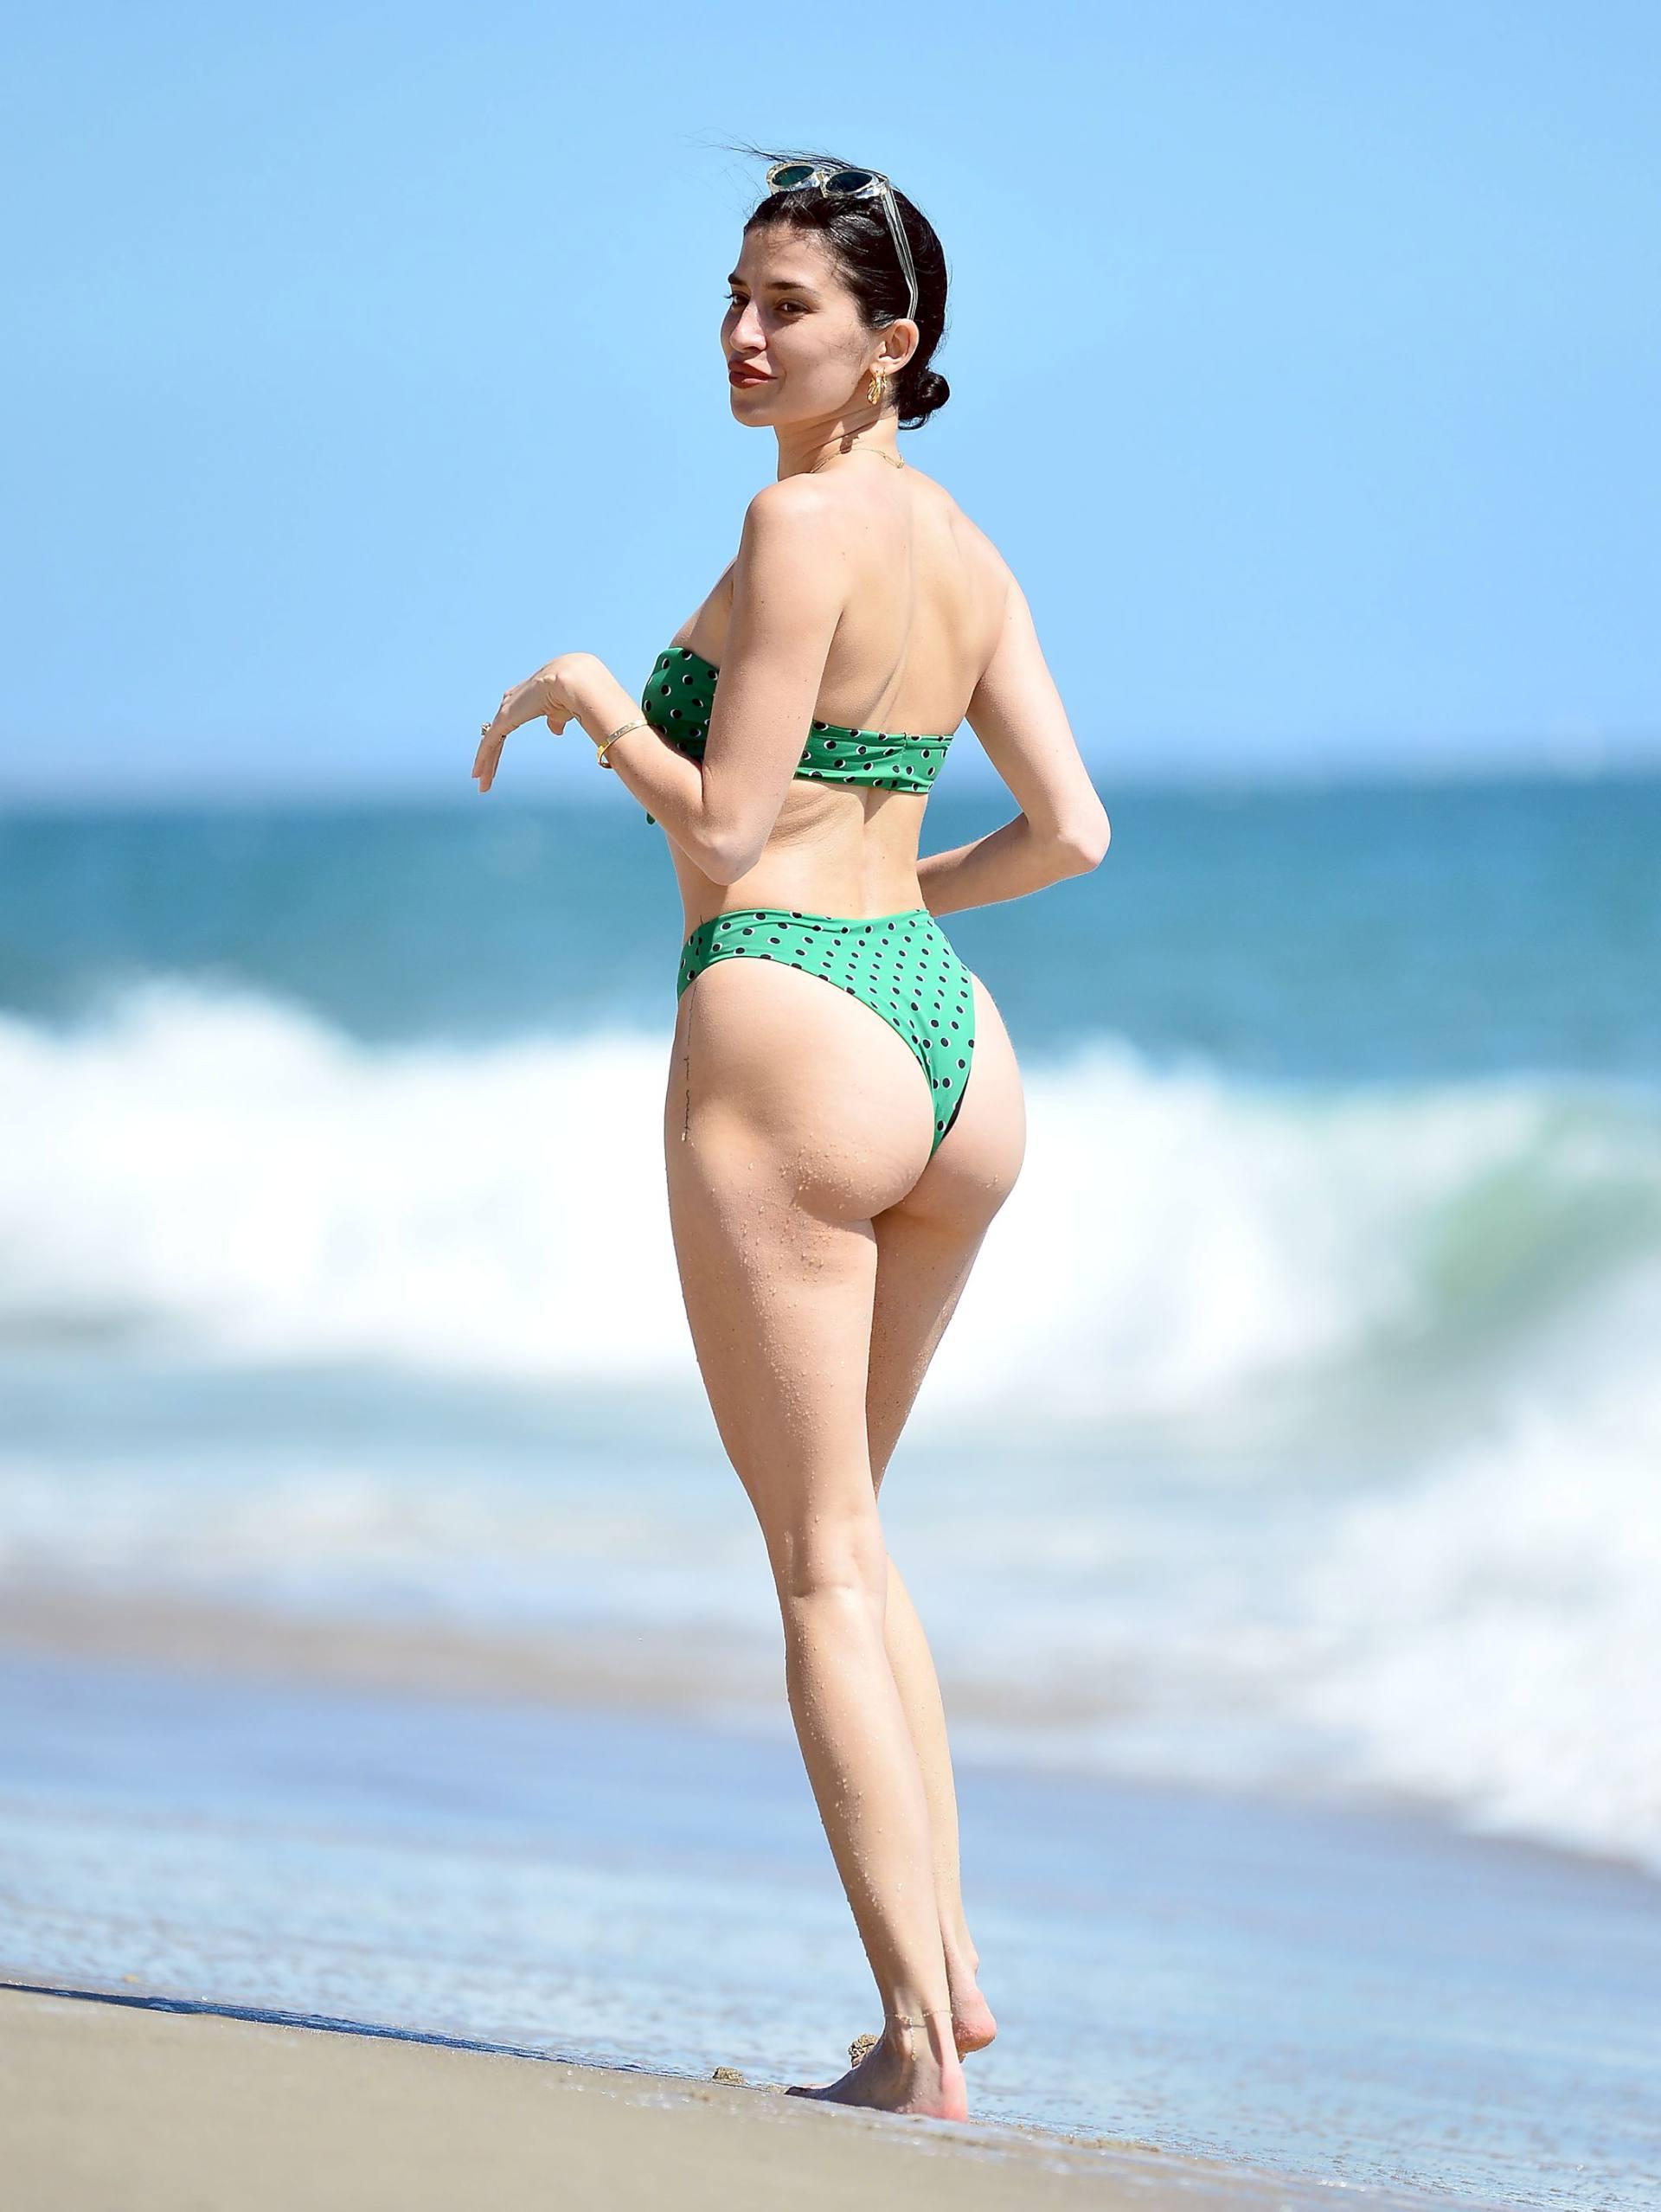 Nicole Williams – Fantastic Body In Skimpy Bikini At The Beach In Malibu 0005